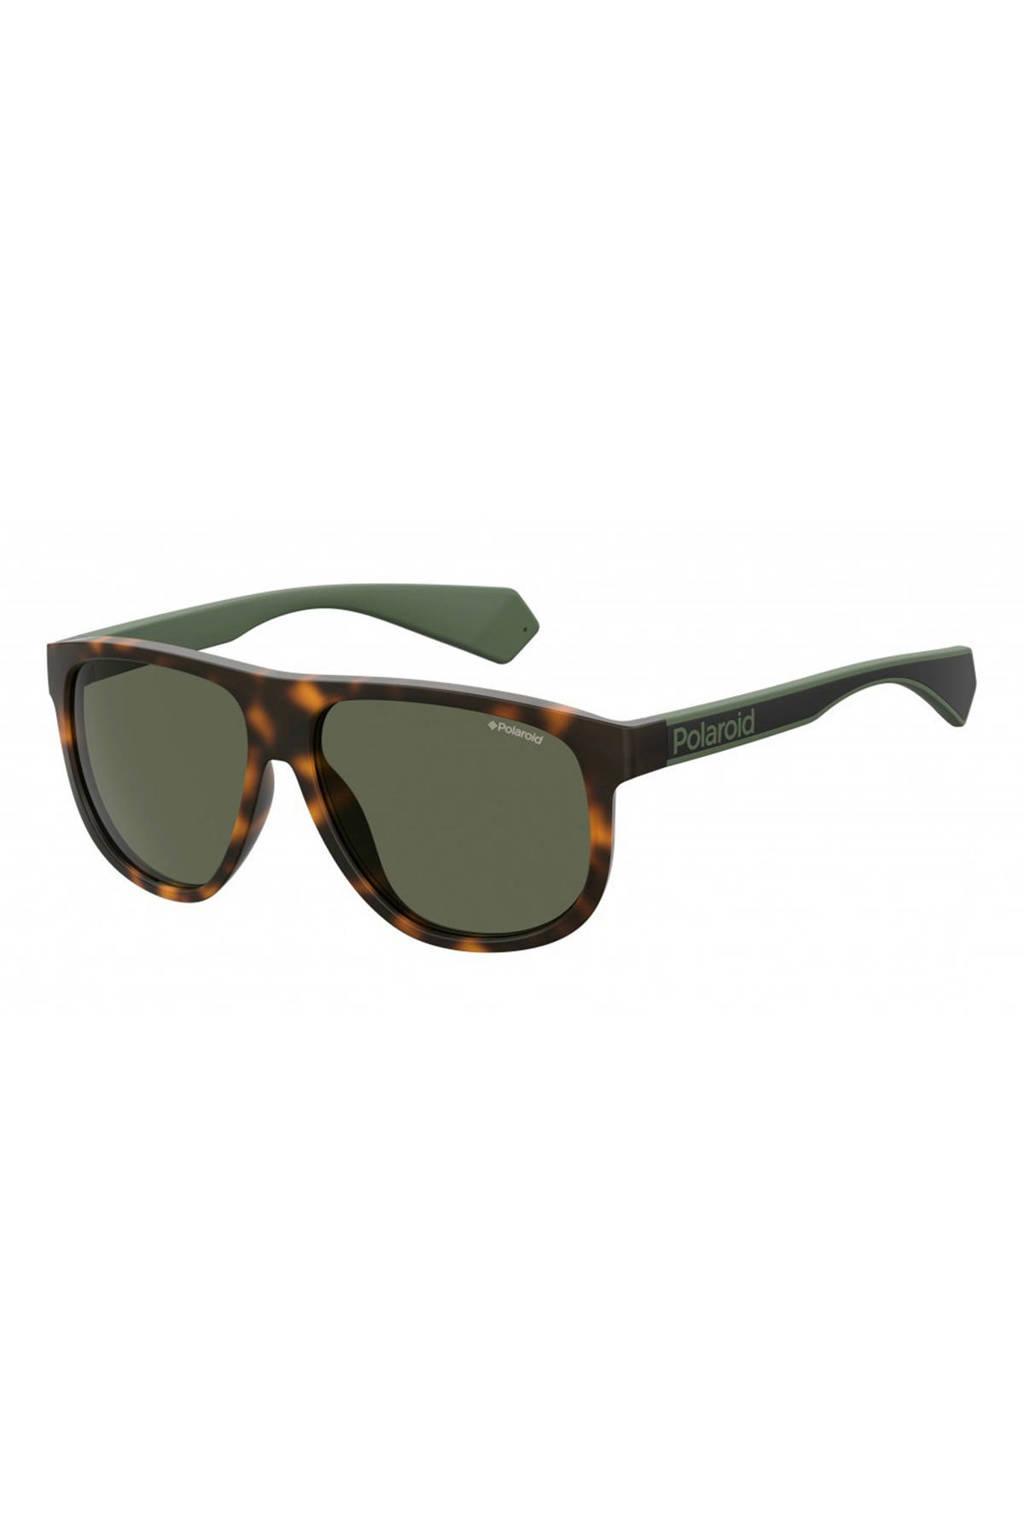 Polaroid zonnebril PLD 2080/S bruin